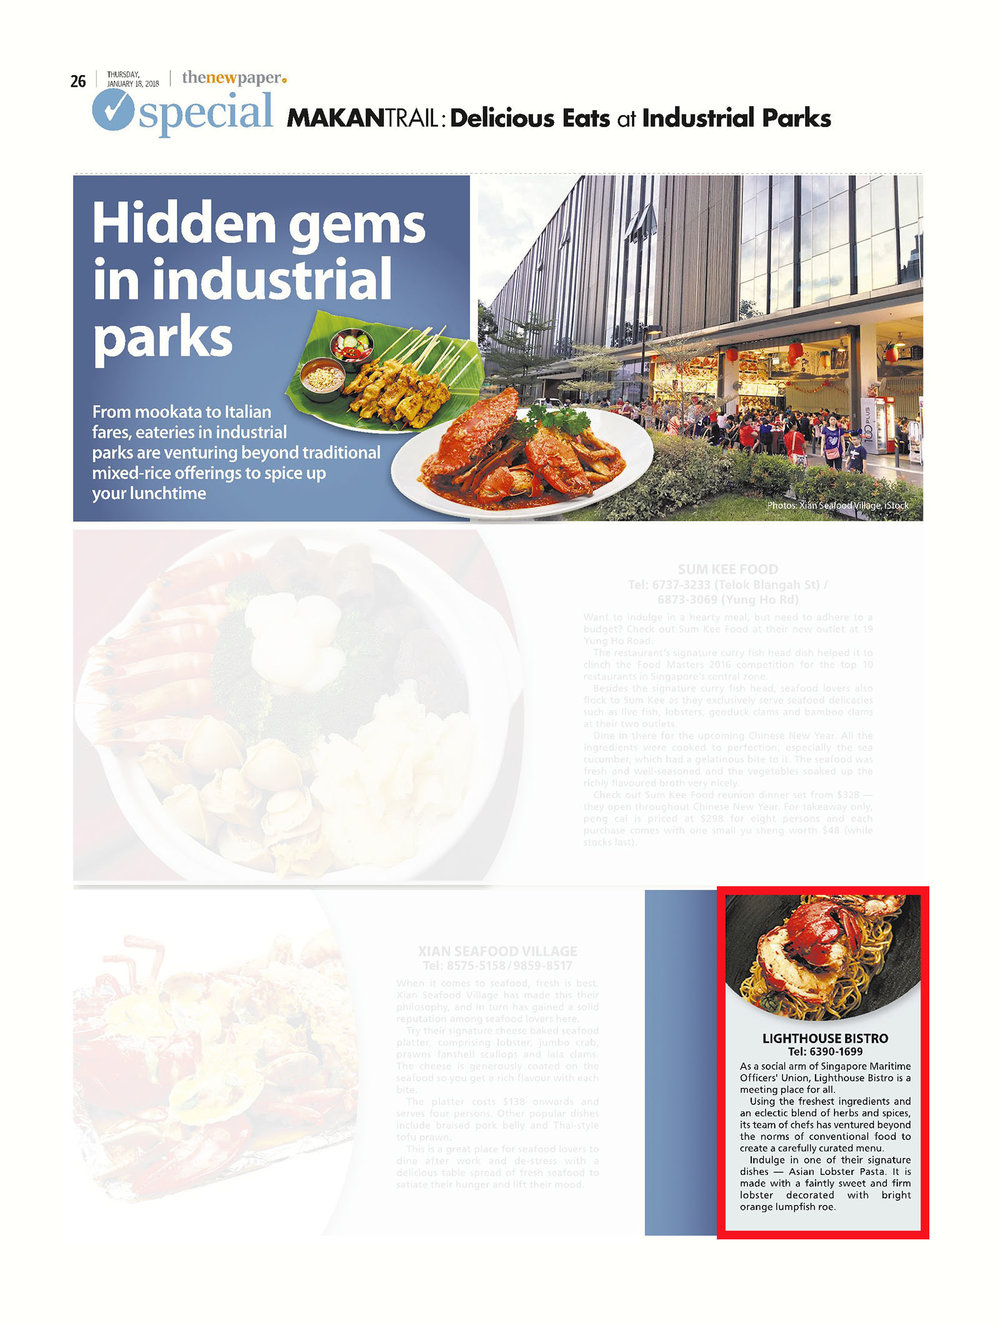 TNP online_Hidden gems in industrial parks_26_web.jpg